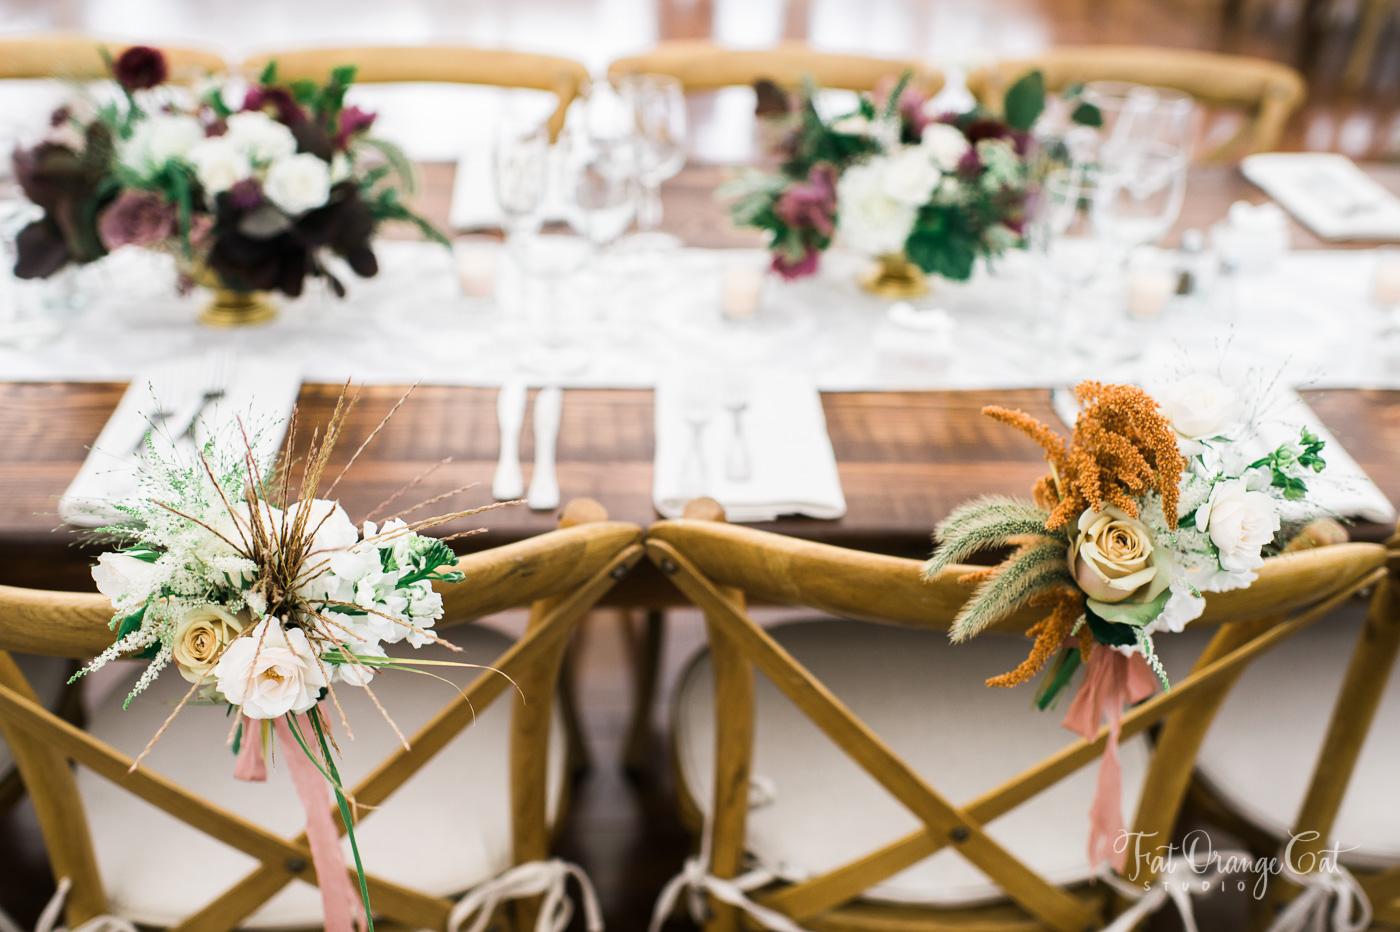 4 Bride and Groom chairs.jpg